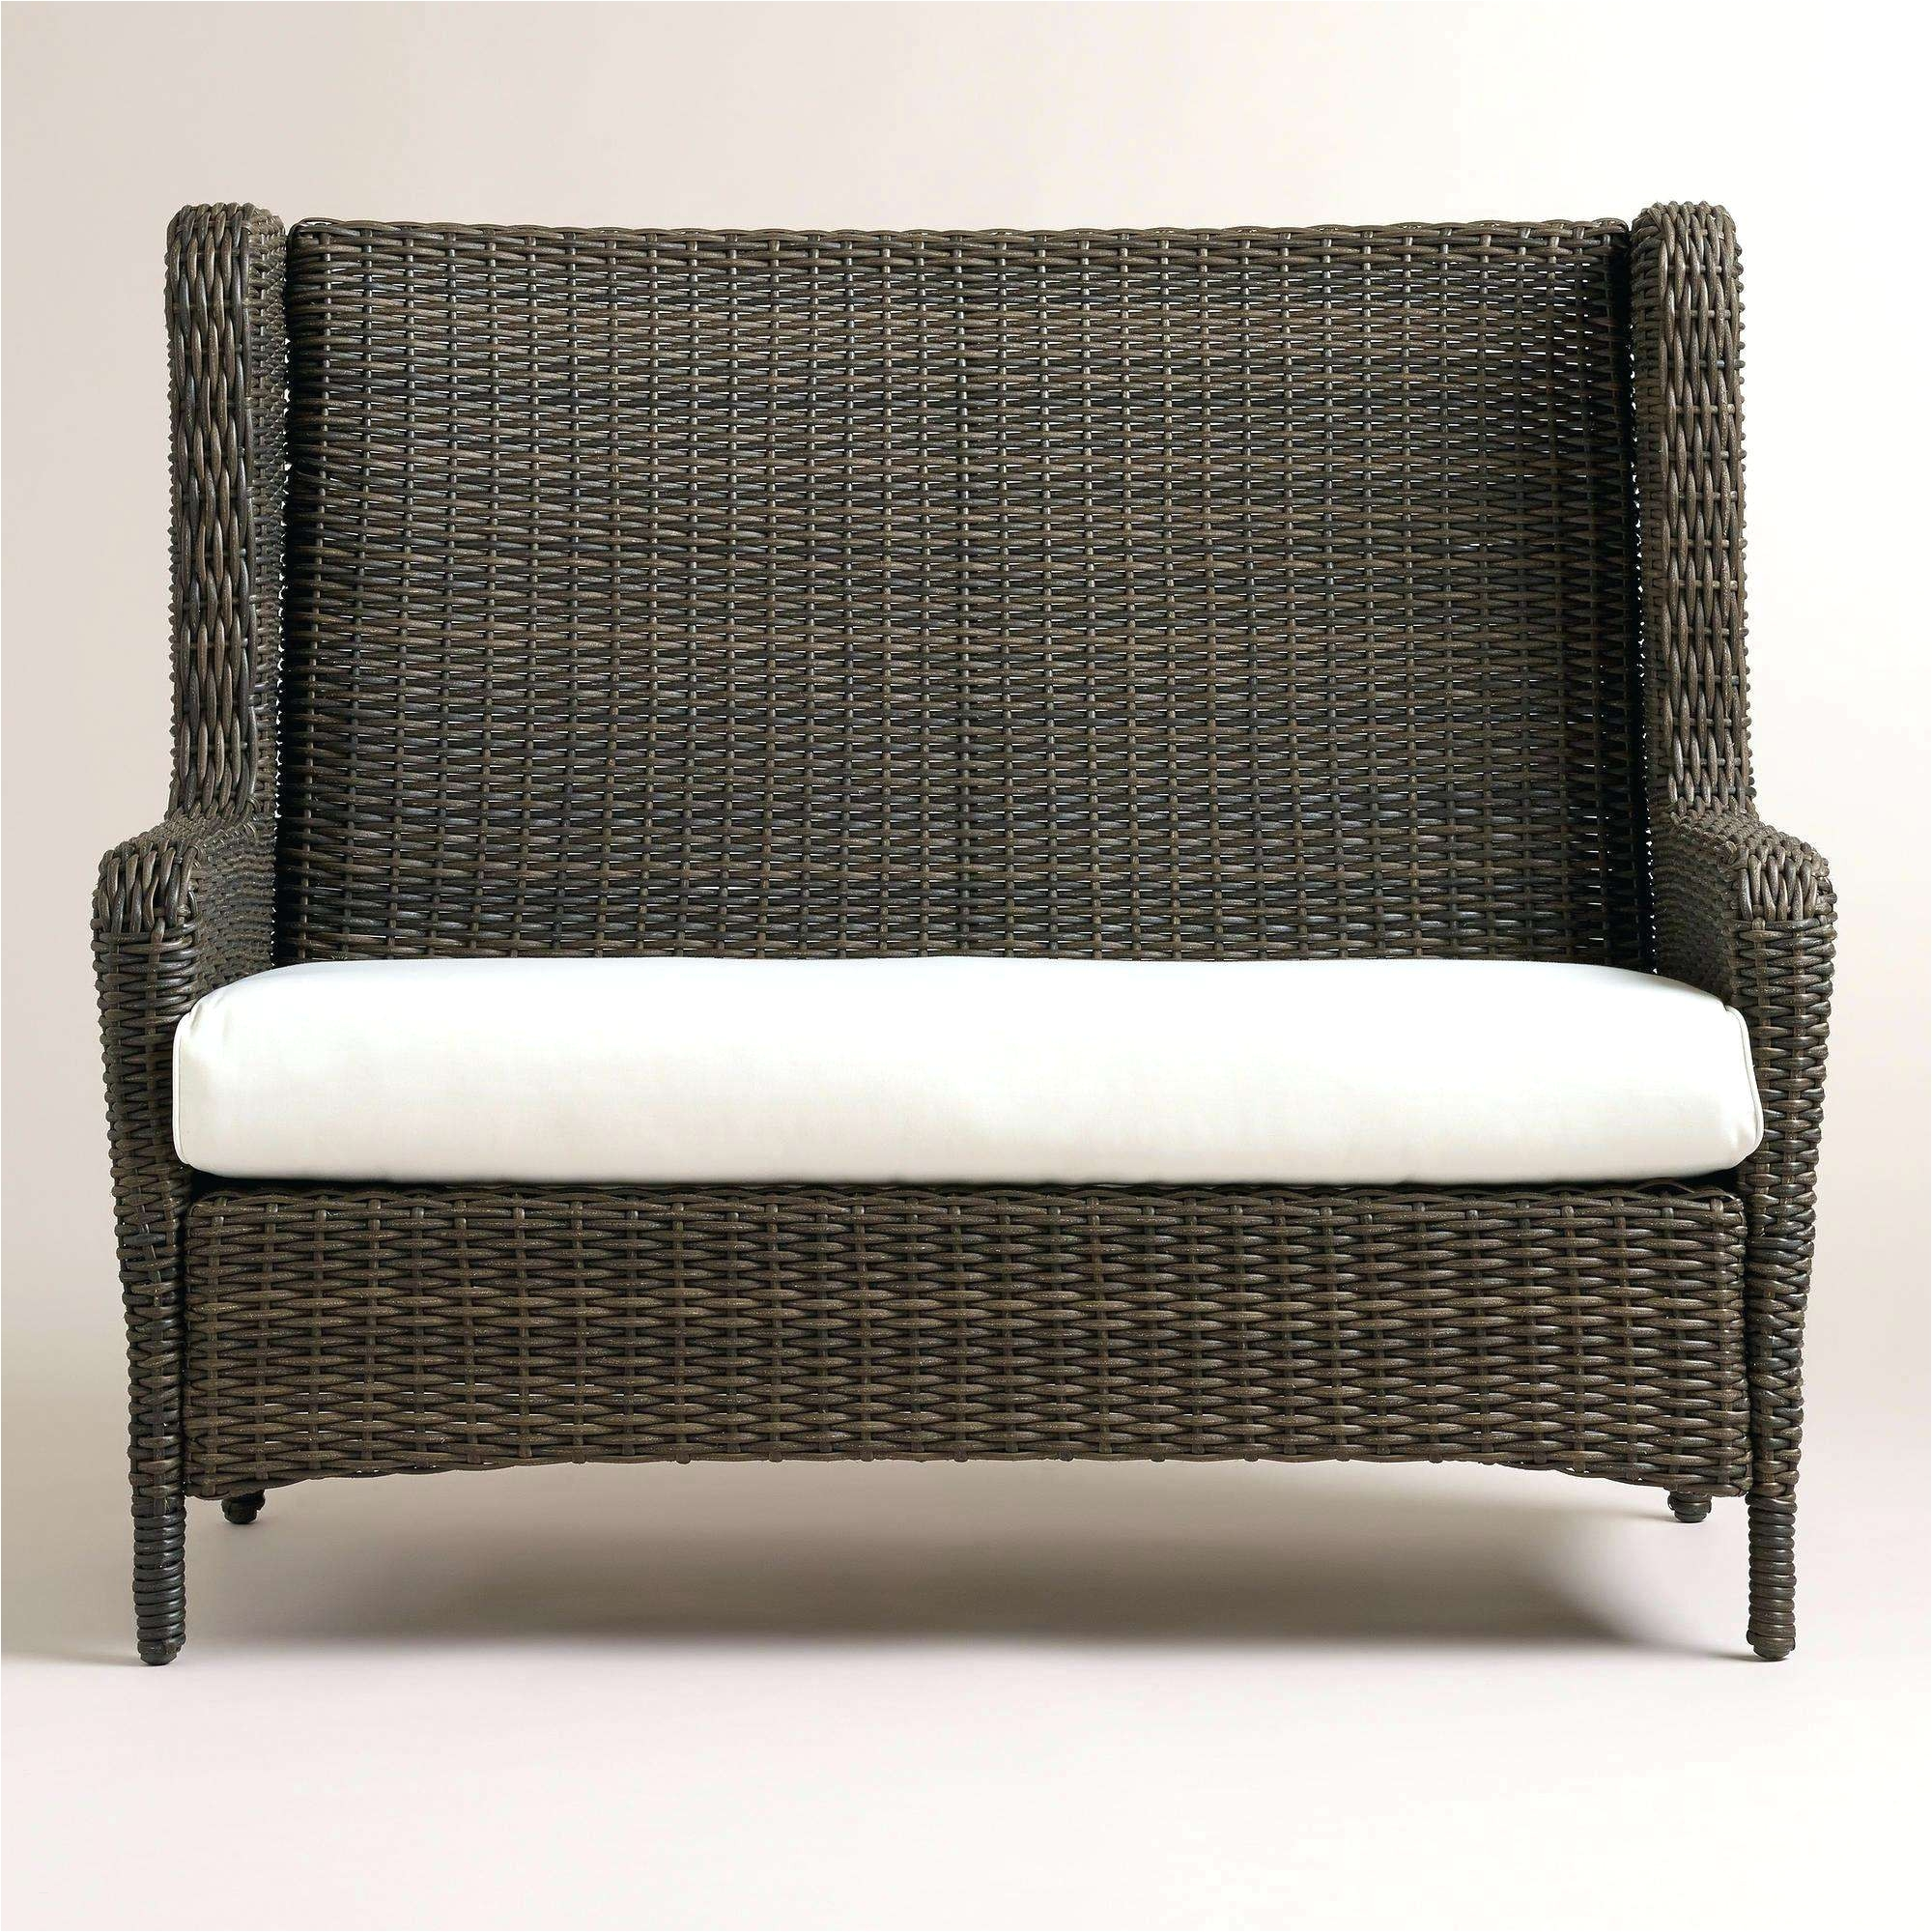 Outdoor Papasan Chair Outdoor Papasan Cushion Unique Wicker Outdoor sofa 0d Patio Chairs